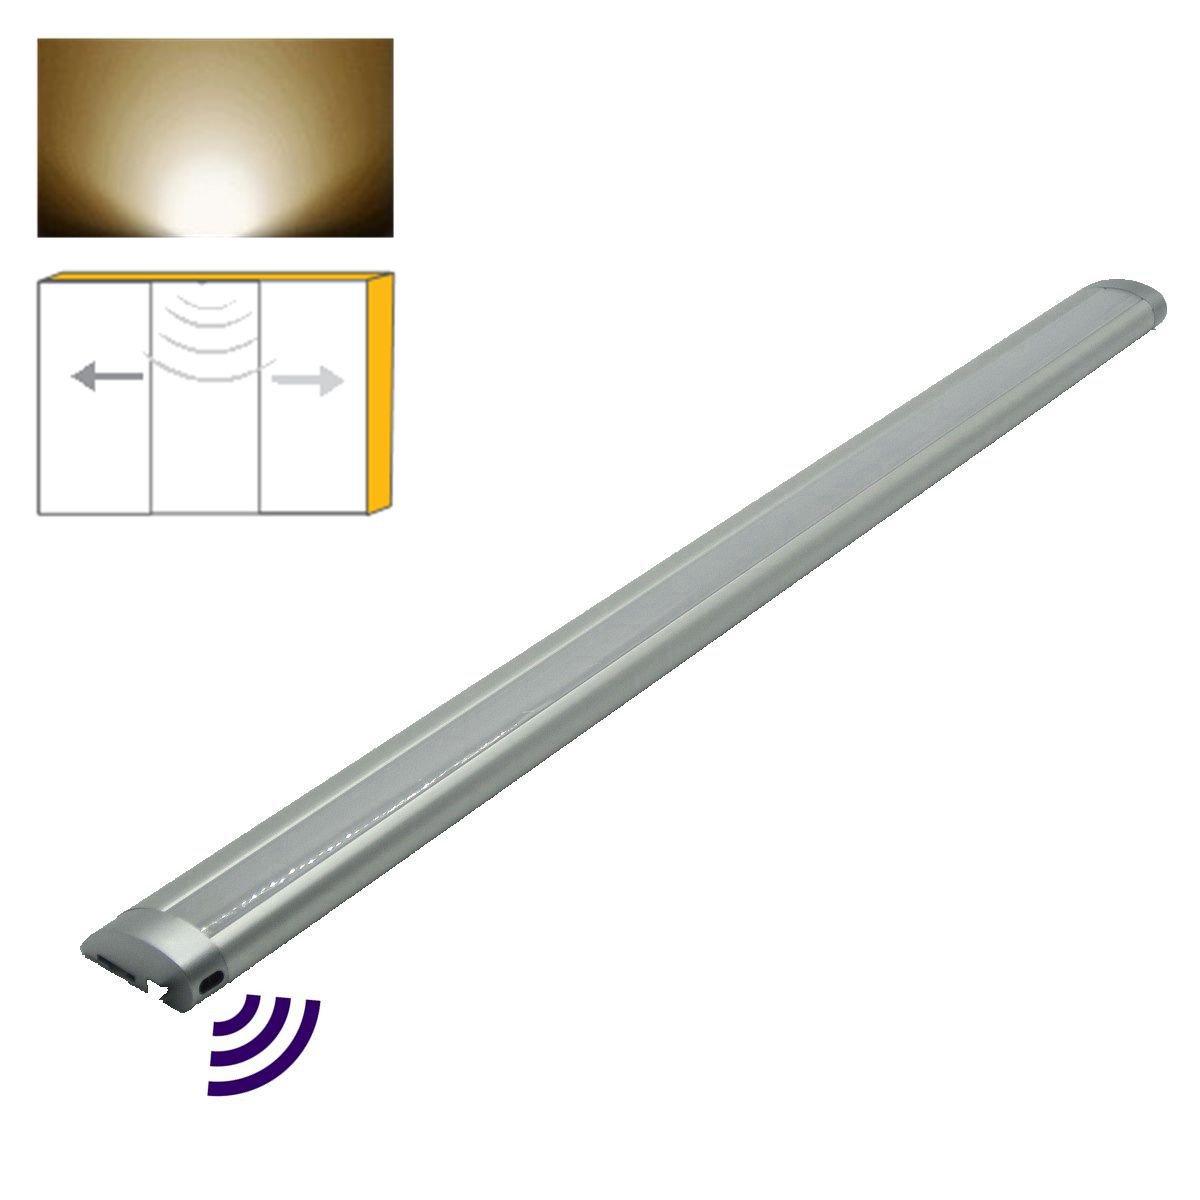 20'' LED Cabinet Light with Door Sensor, Light Turn On/Off at Door Close/Open, Wardrobe,Closet, Drawer, Cupboard Task Light with 12V Adapter by Lightlink (Door Sensor, 4000K Neutral White)